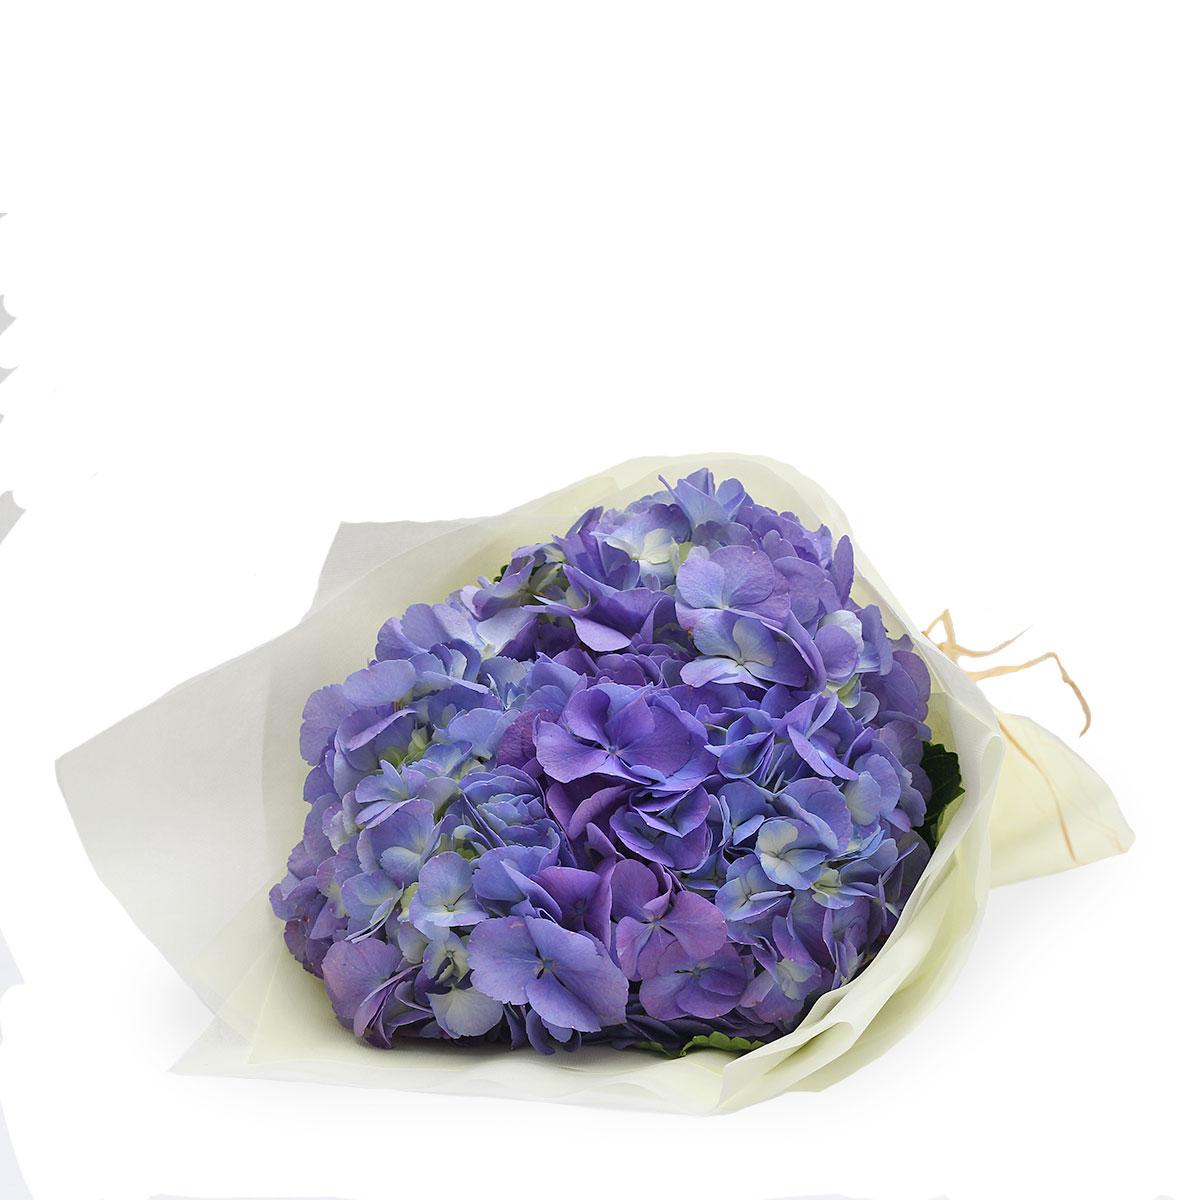 BQ1748 rustic radiance blue hydrangea